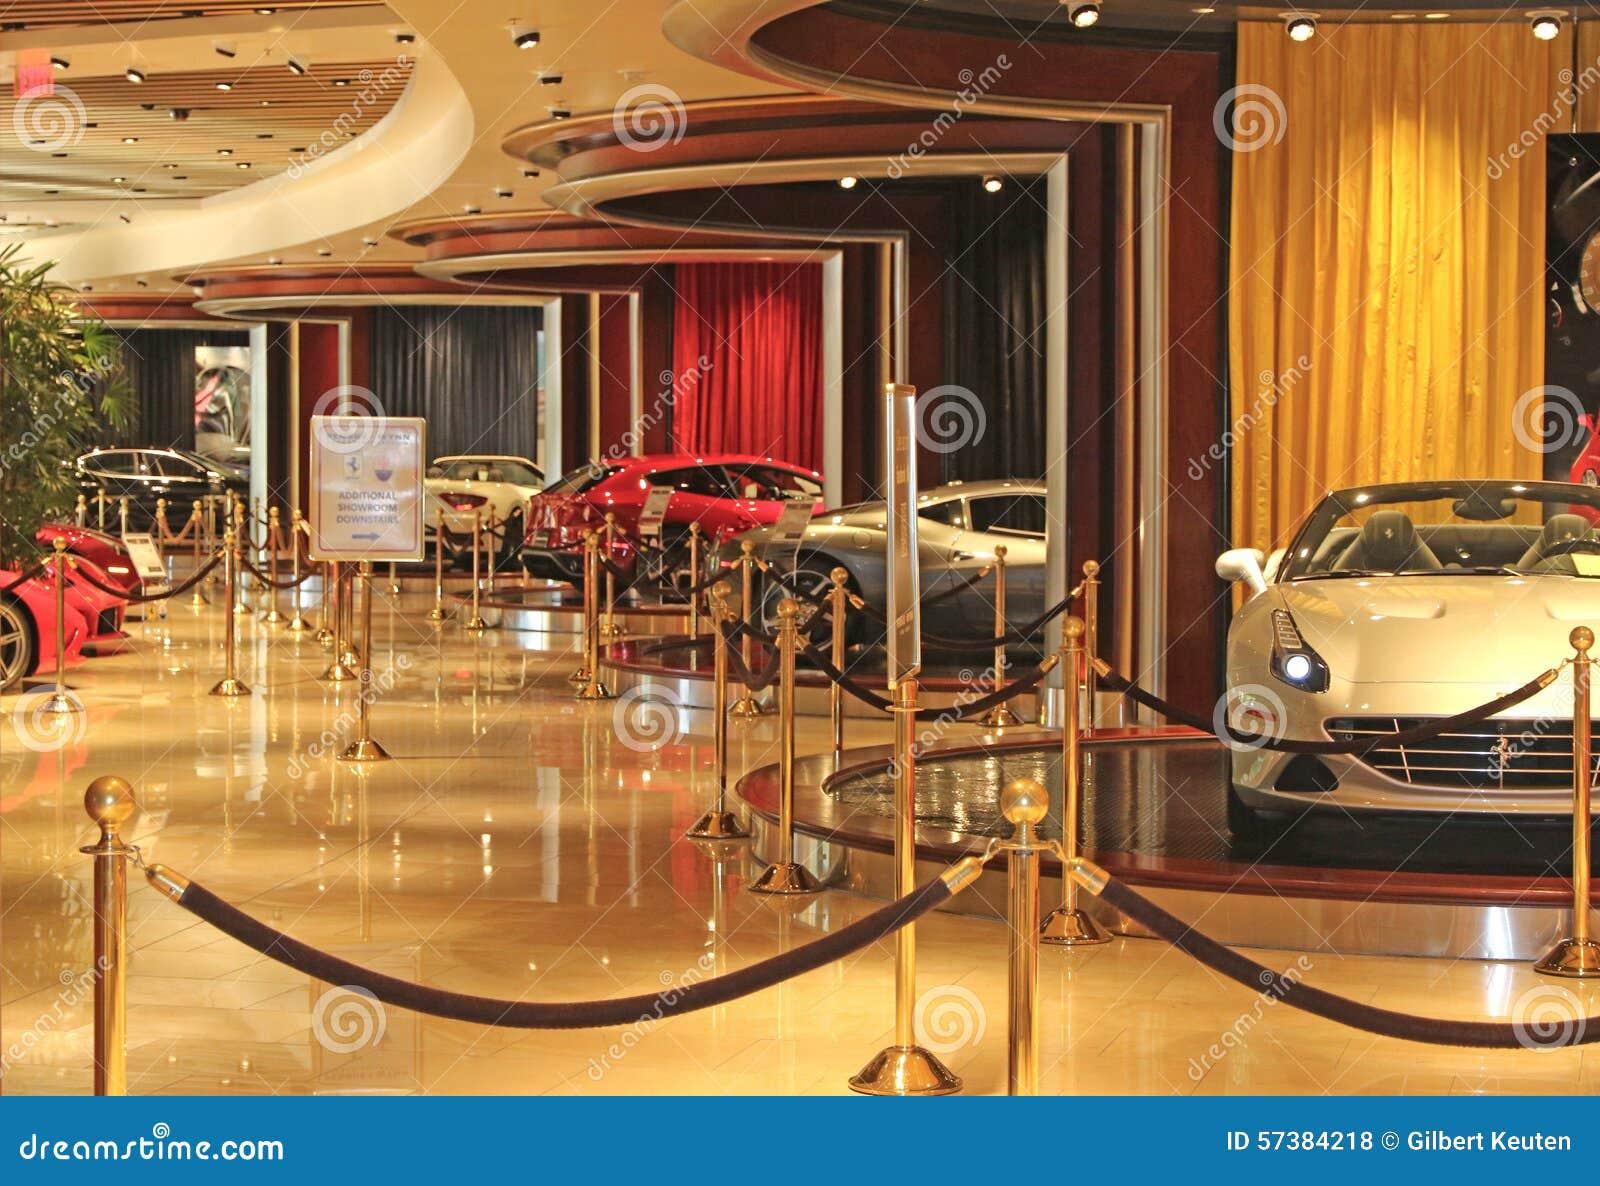 116 Ferrari Dealership Photos Free Royalty Free Stock Photos From Dreamstime